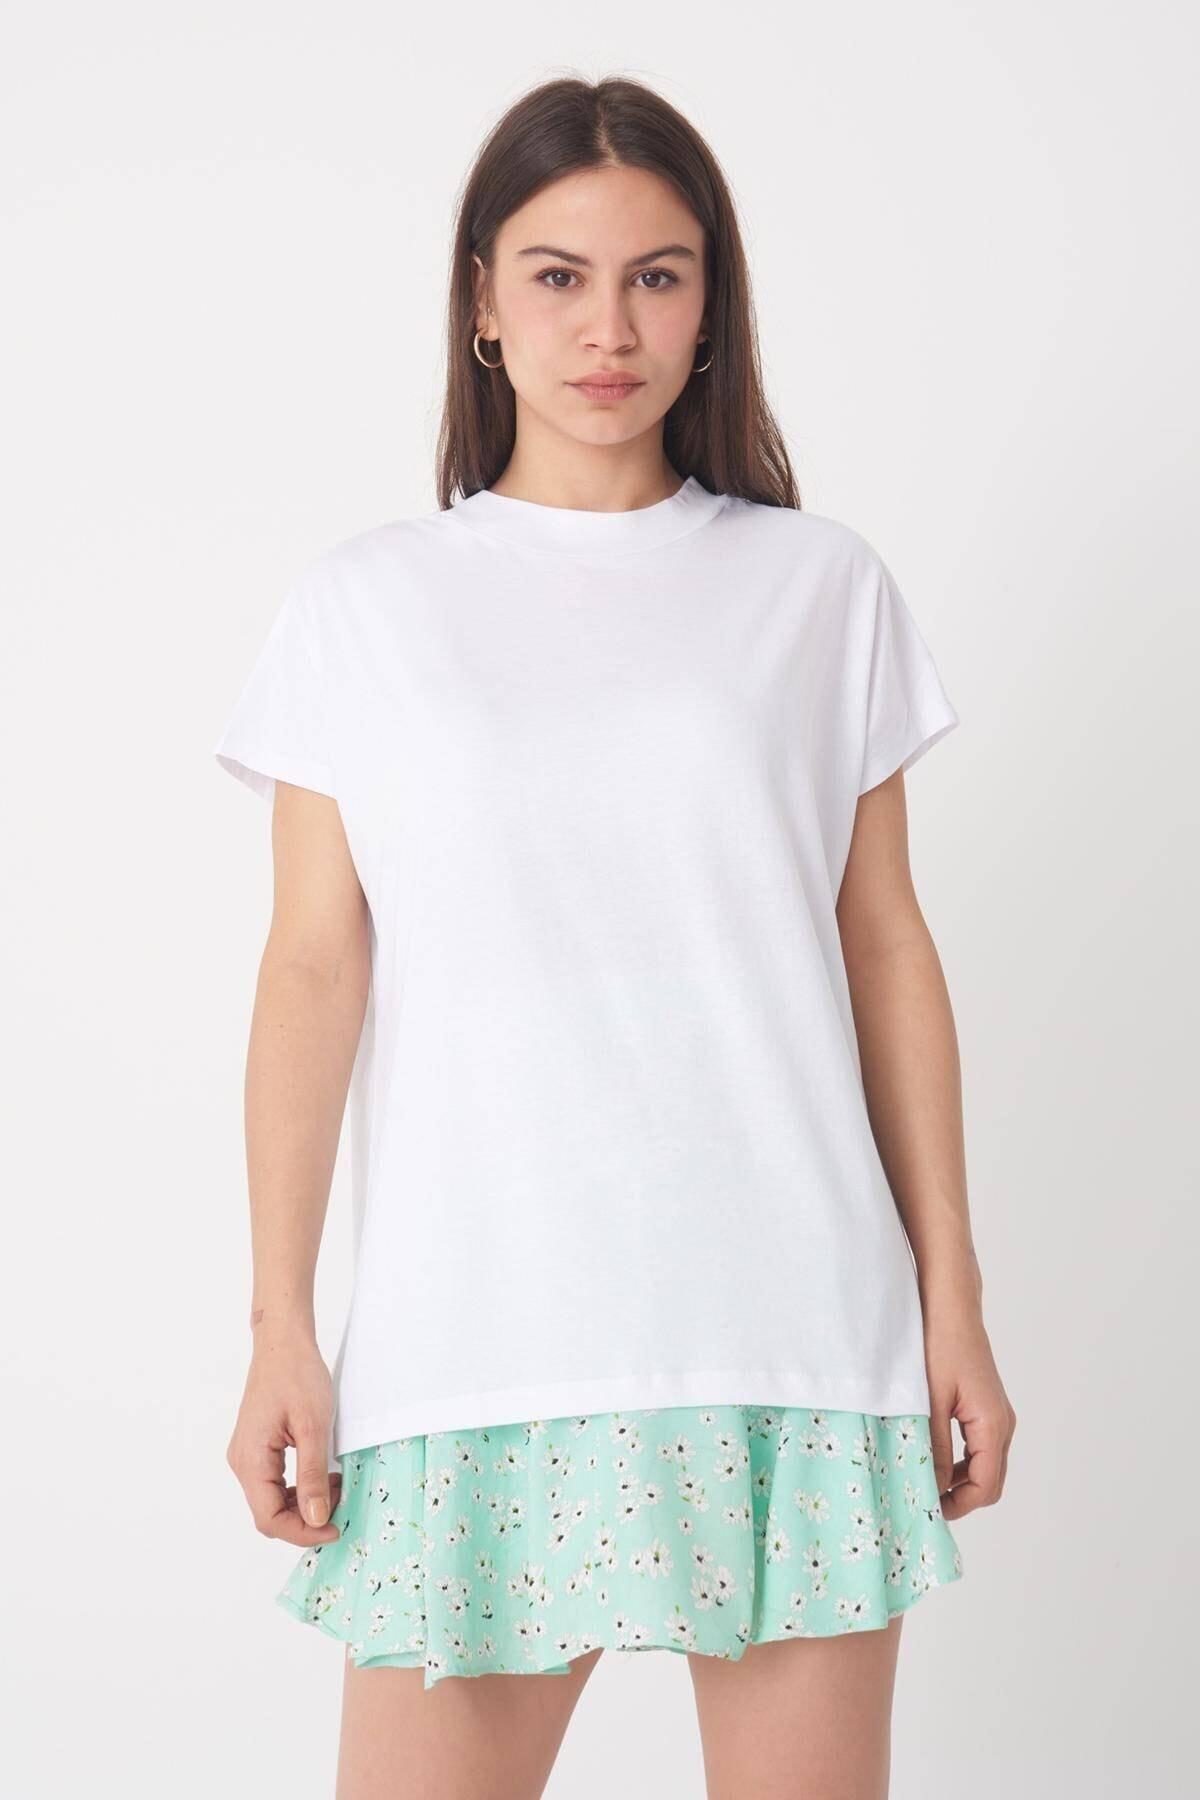 Addax Basic T-shirt P0769 - U13 1